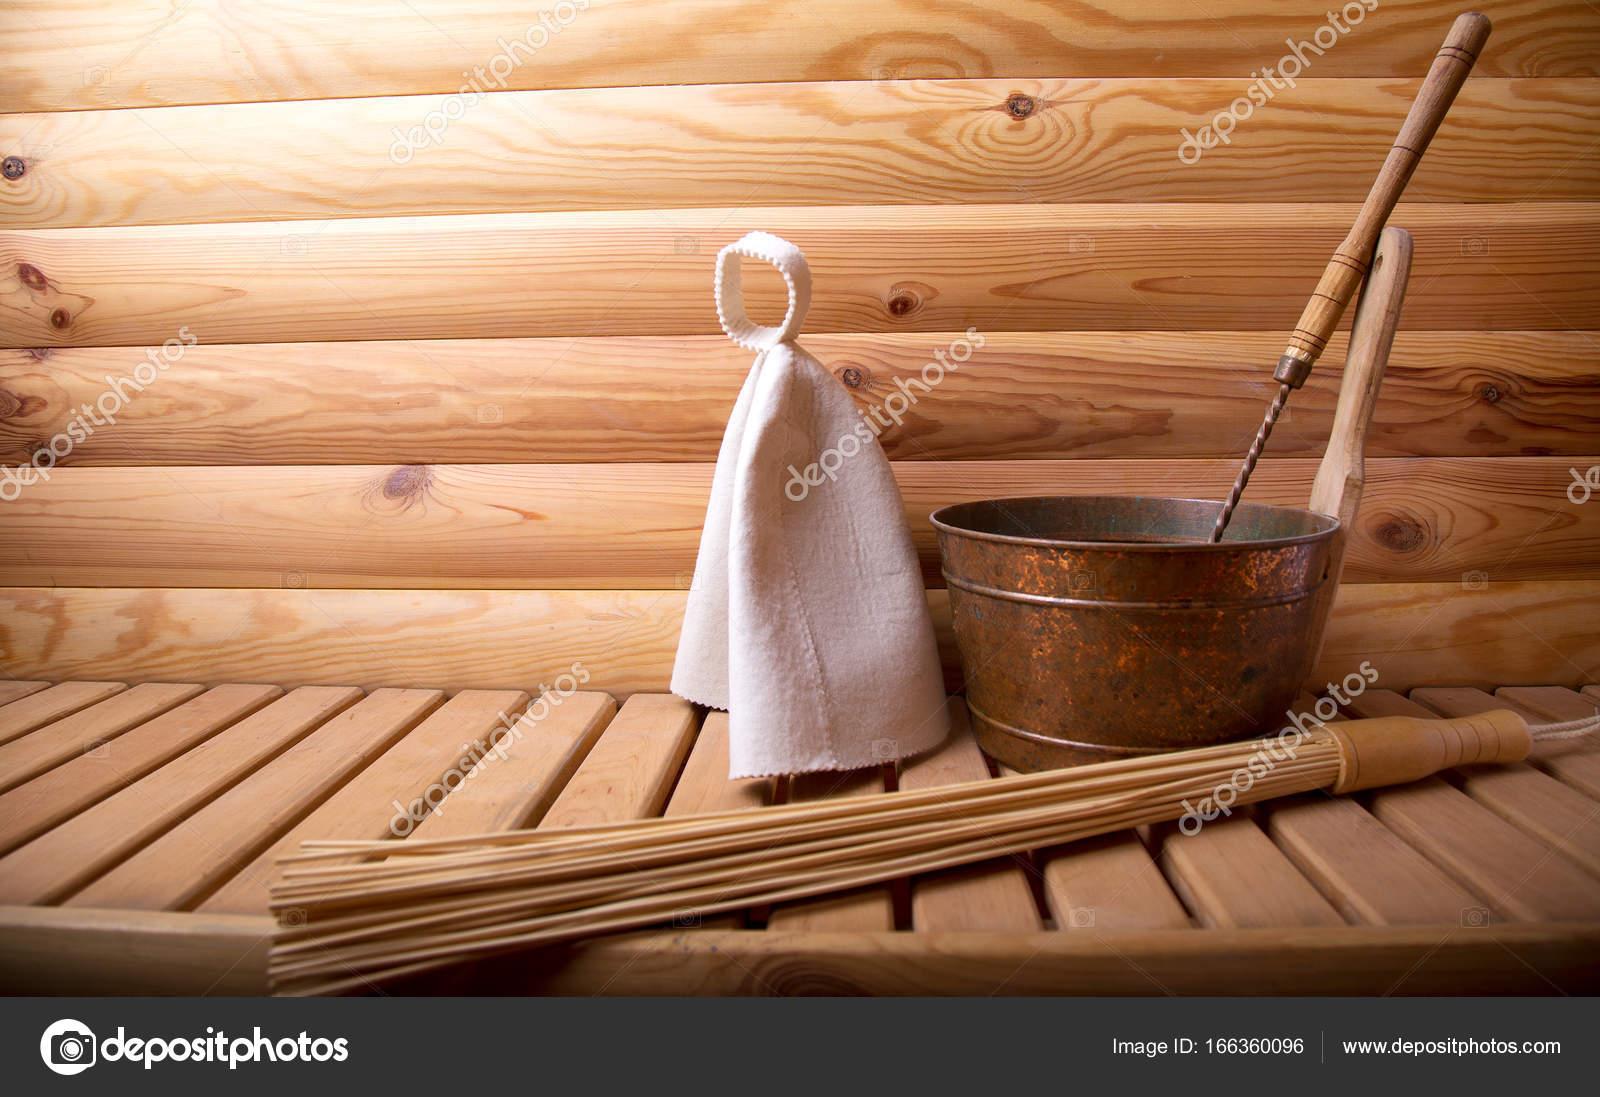 Accessori In Legno Per Bagno : Accessori per bagno e sauna su una sauna in legno u foto stock